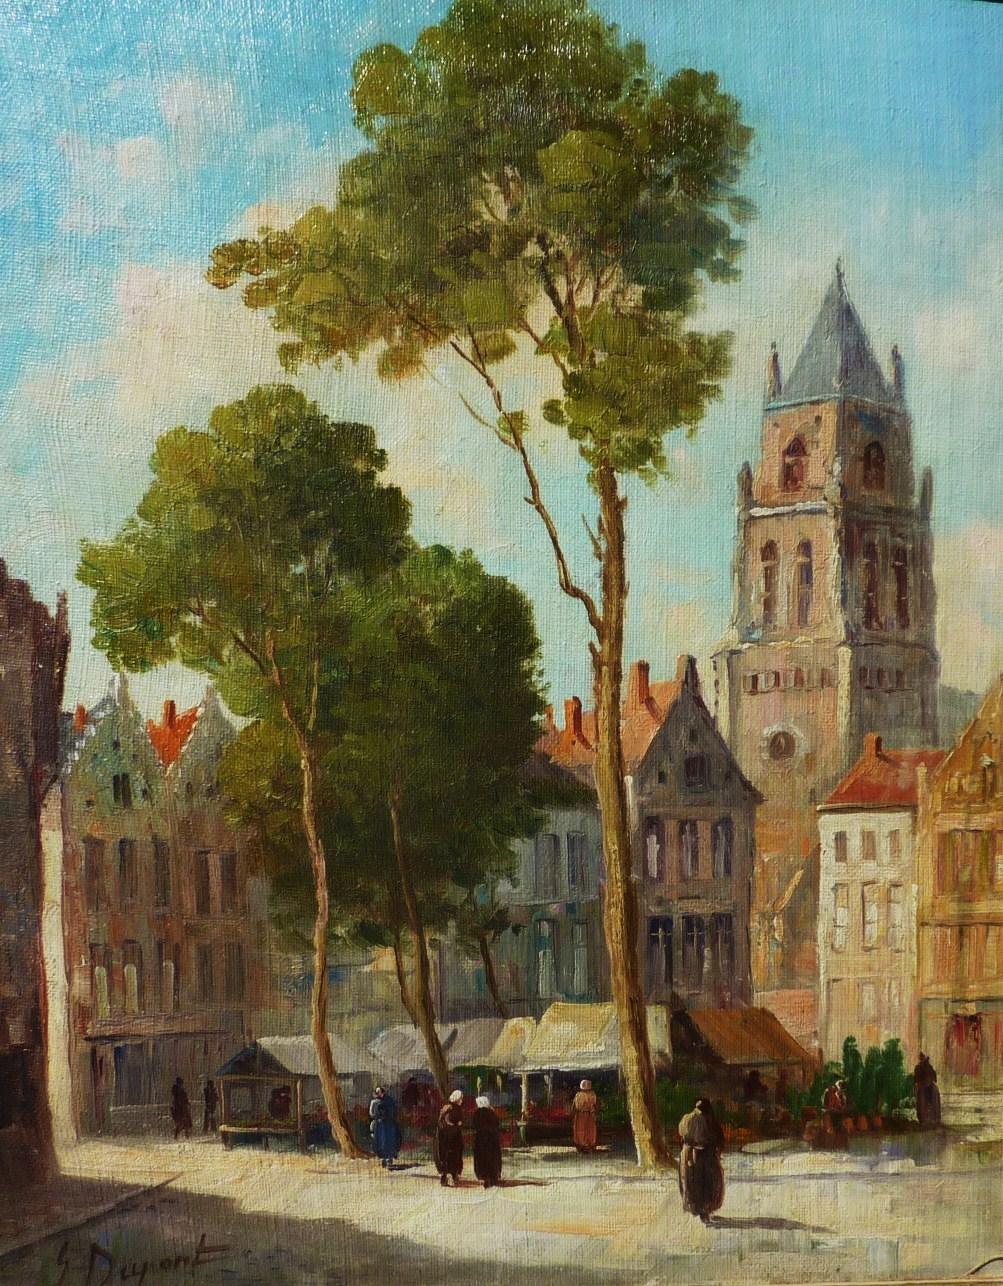 GDupont Early 20th Century Belgian Artist Impressionist Street Scene From Dg On Ruby Lane